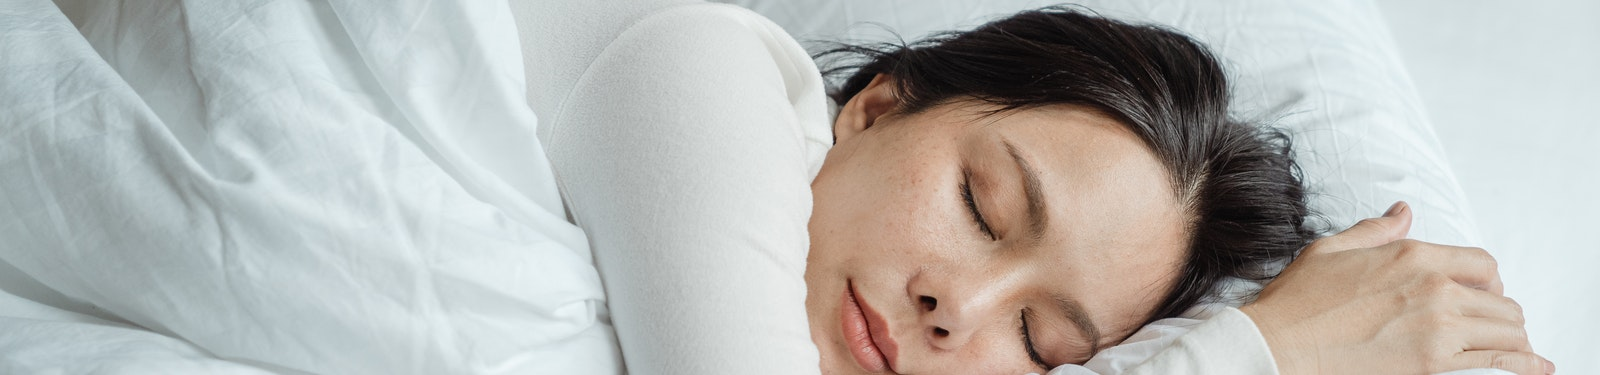 la falta de sueño sube de peso